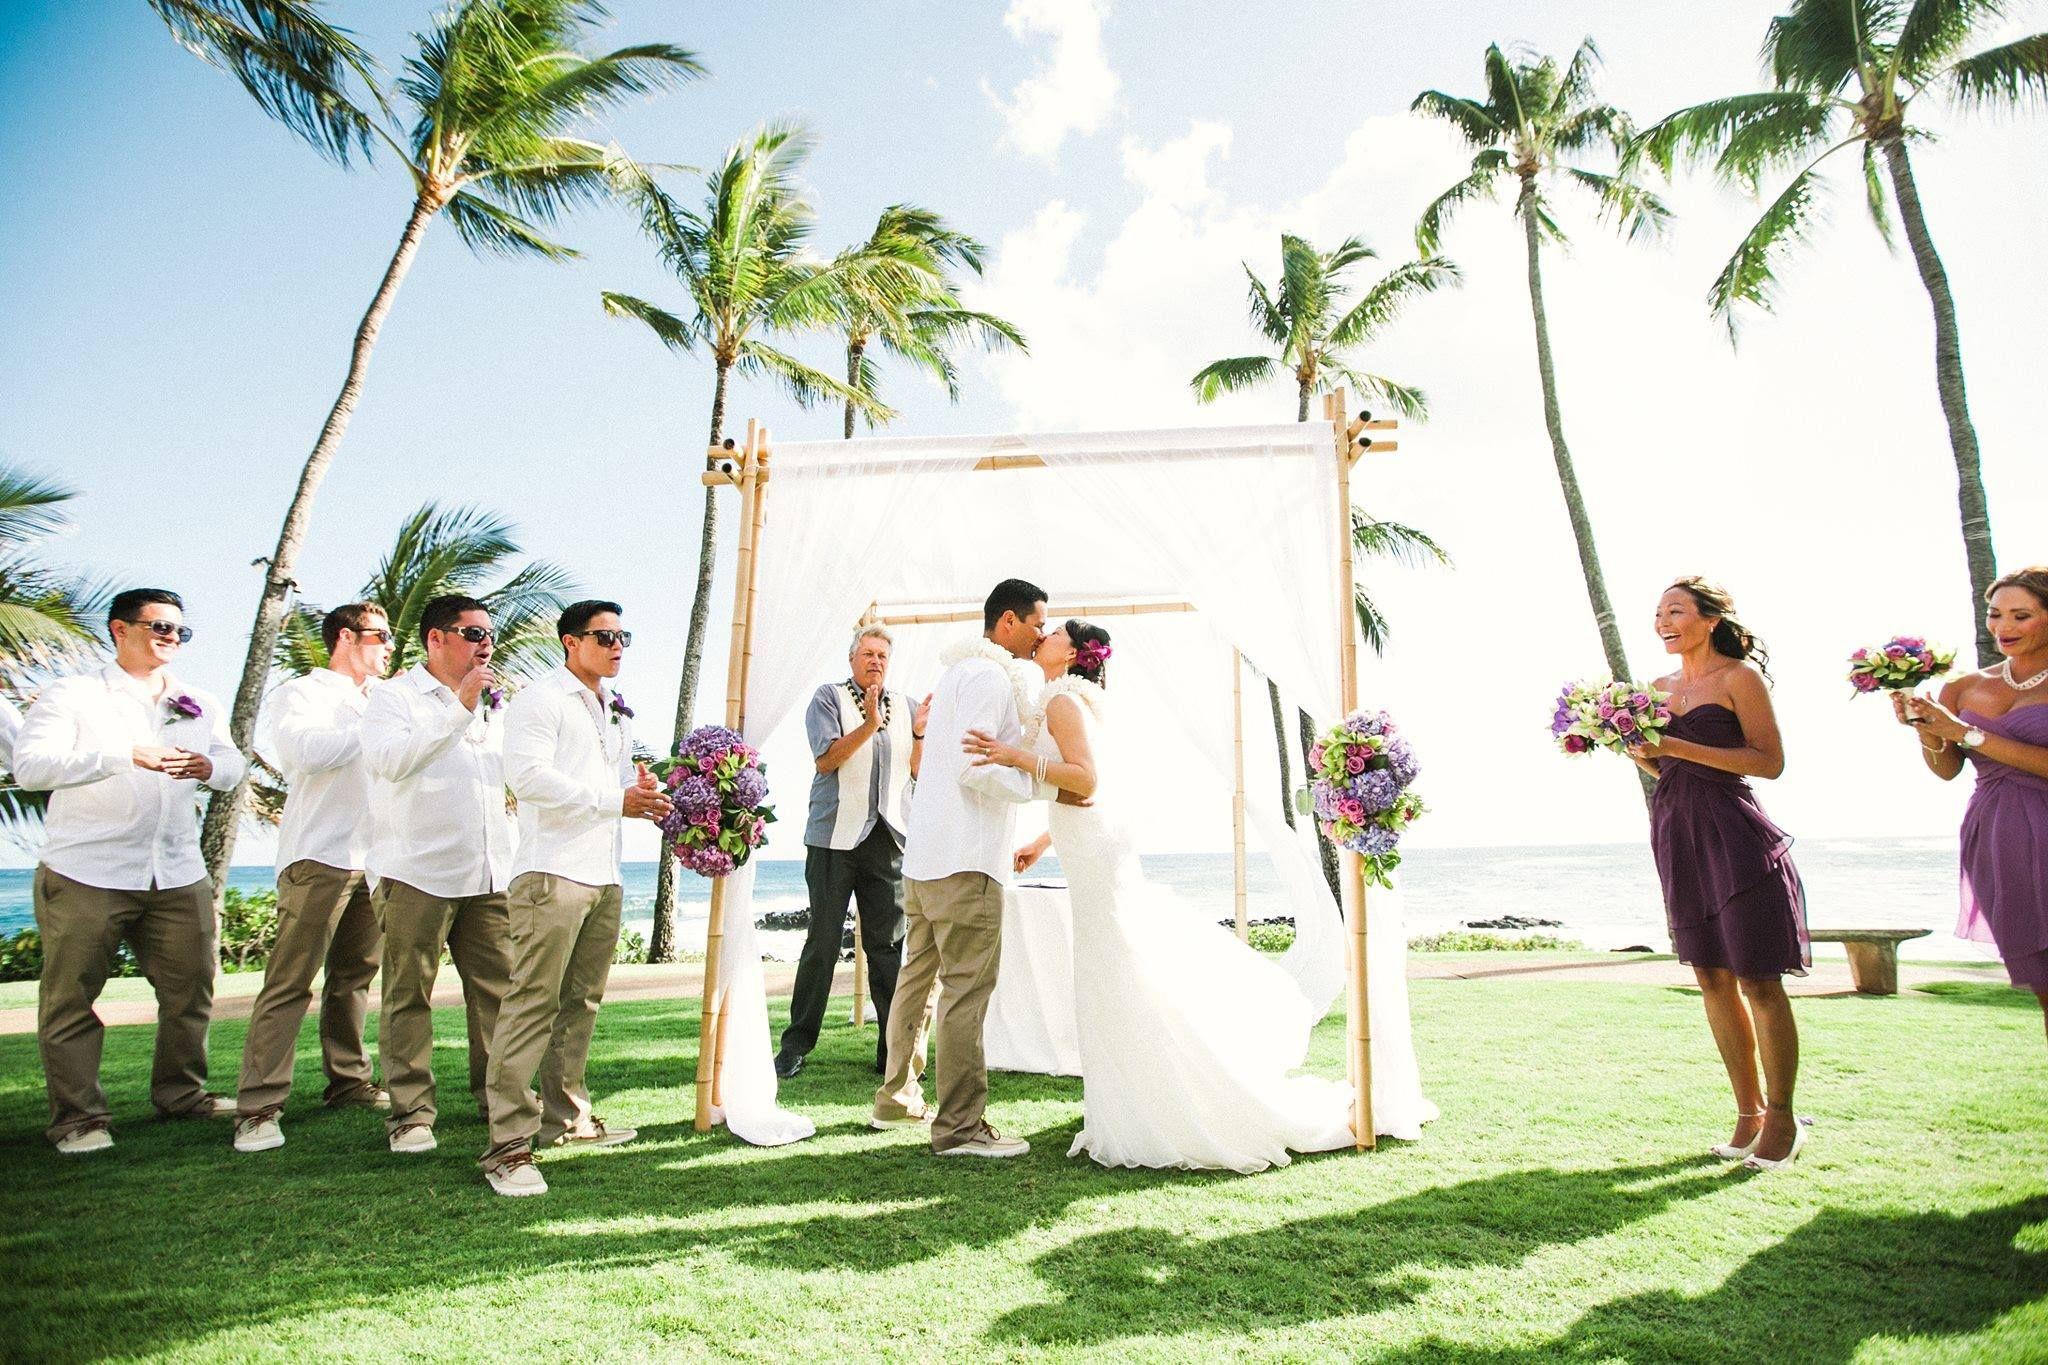 small beach wedding ceremony ideas%0A Colorful Kauai Hawaii Wedding Ceremony Beach    Venue  Sheraton Kauai  Resort   Coordination